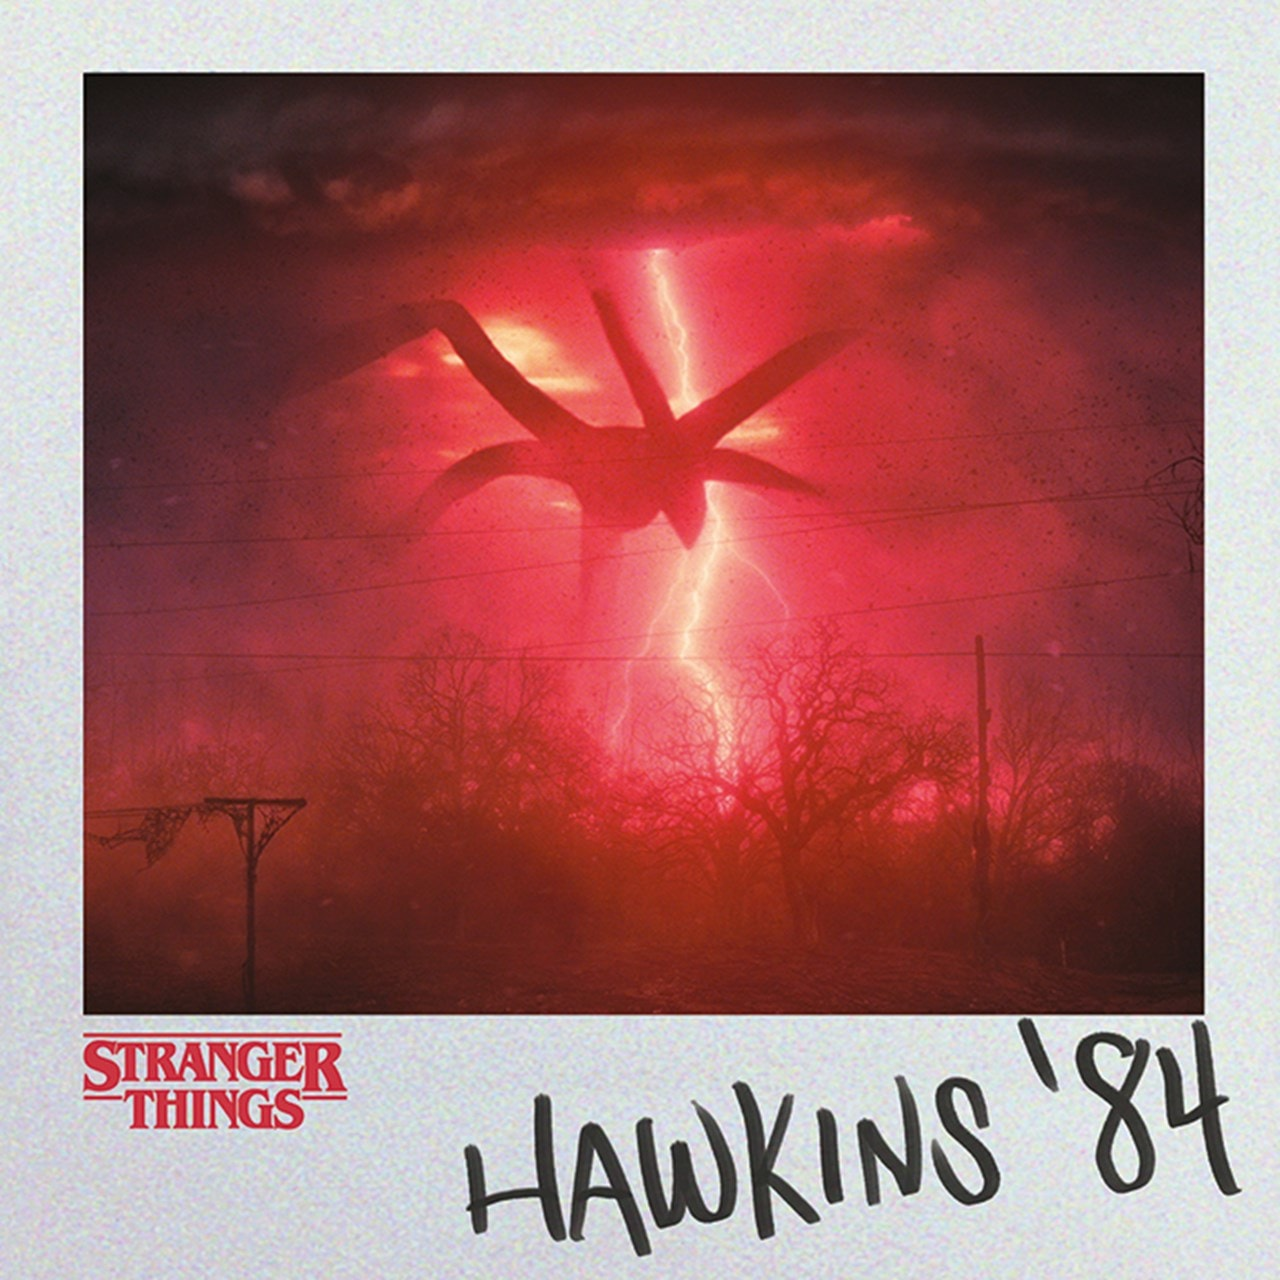 Hawkins 84: Stranger Things Canvas Print - 1